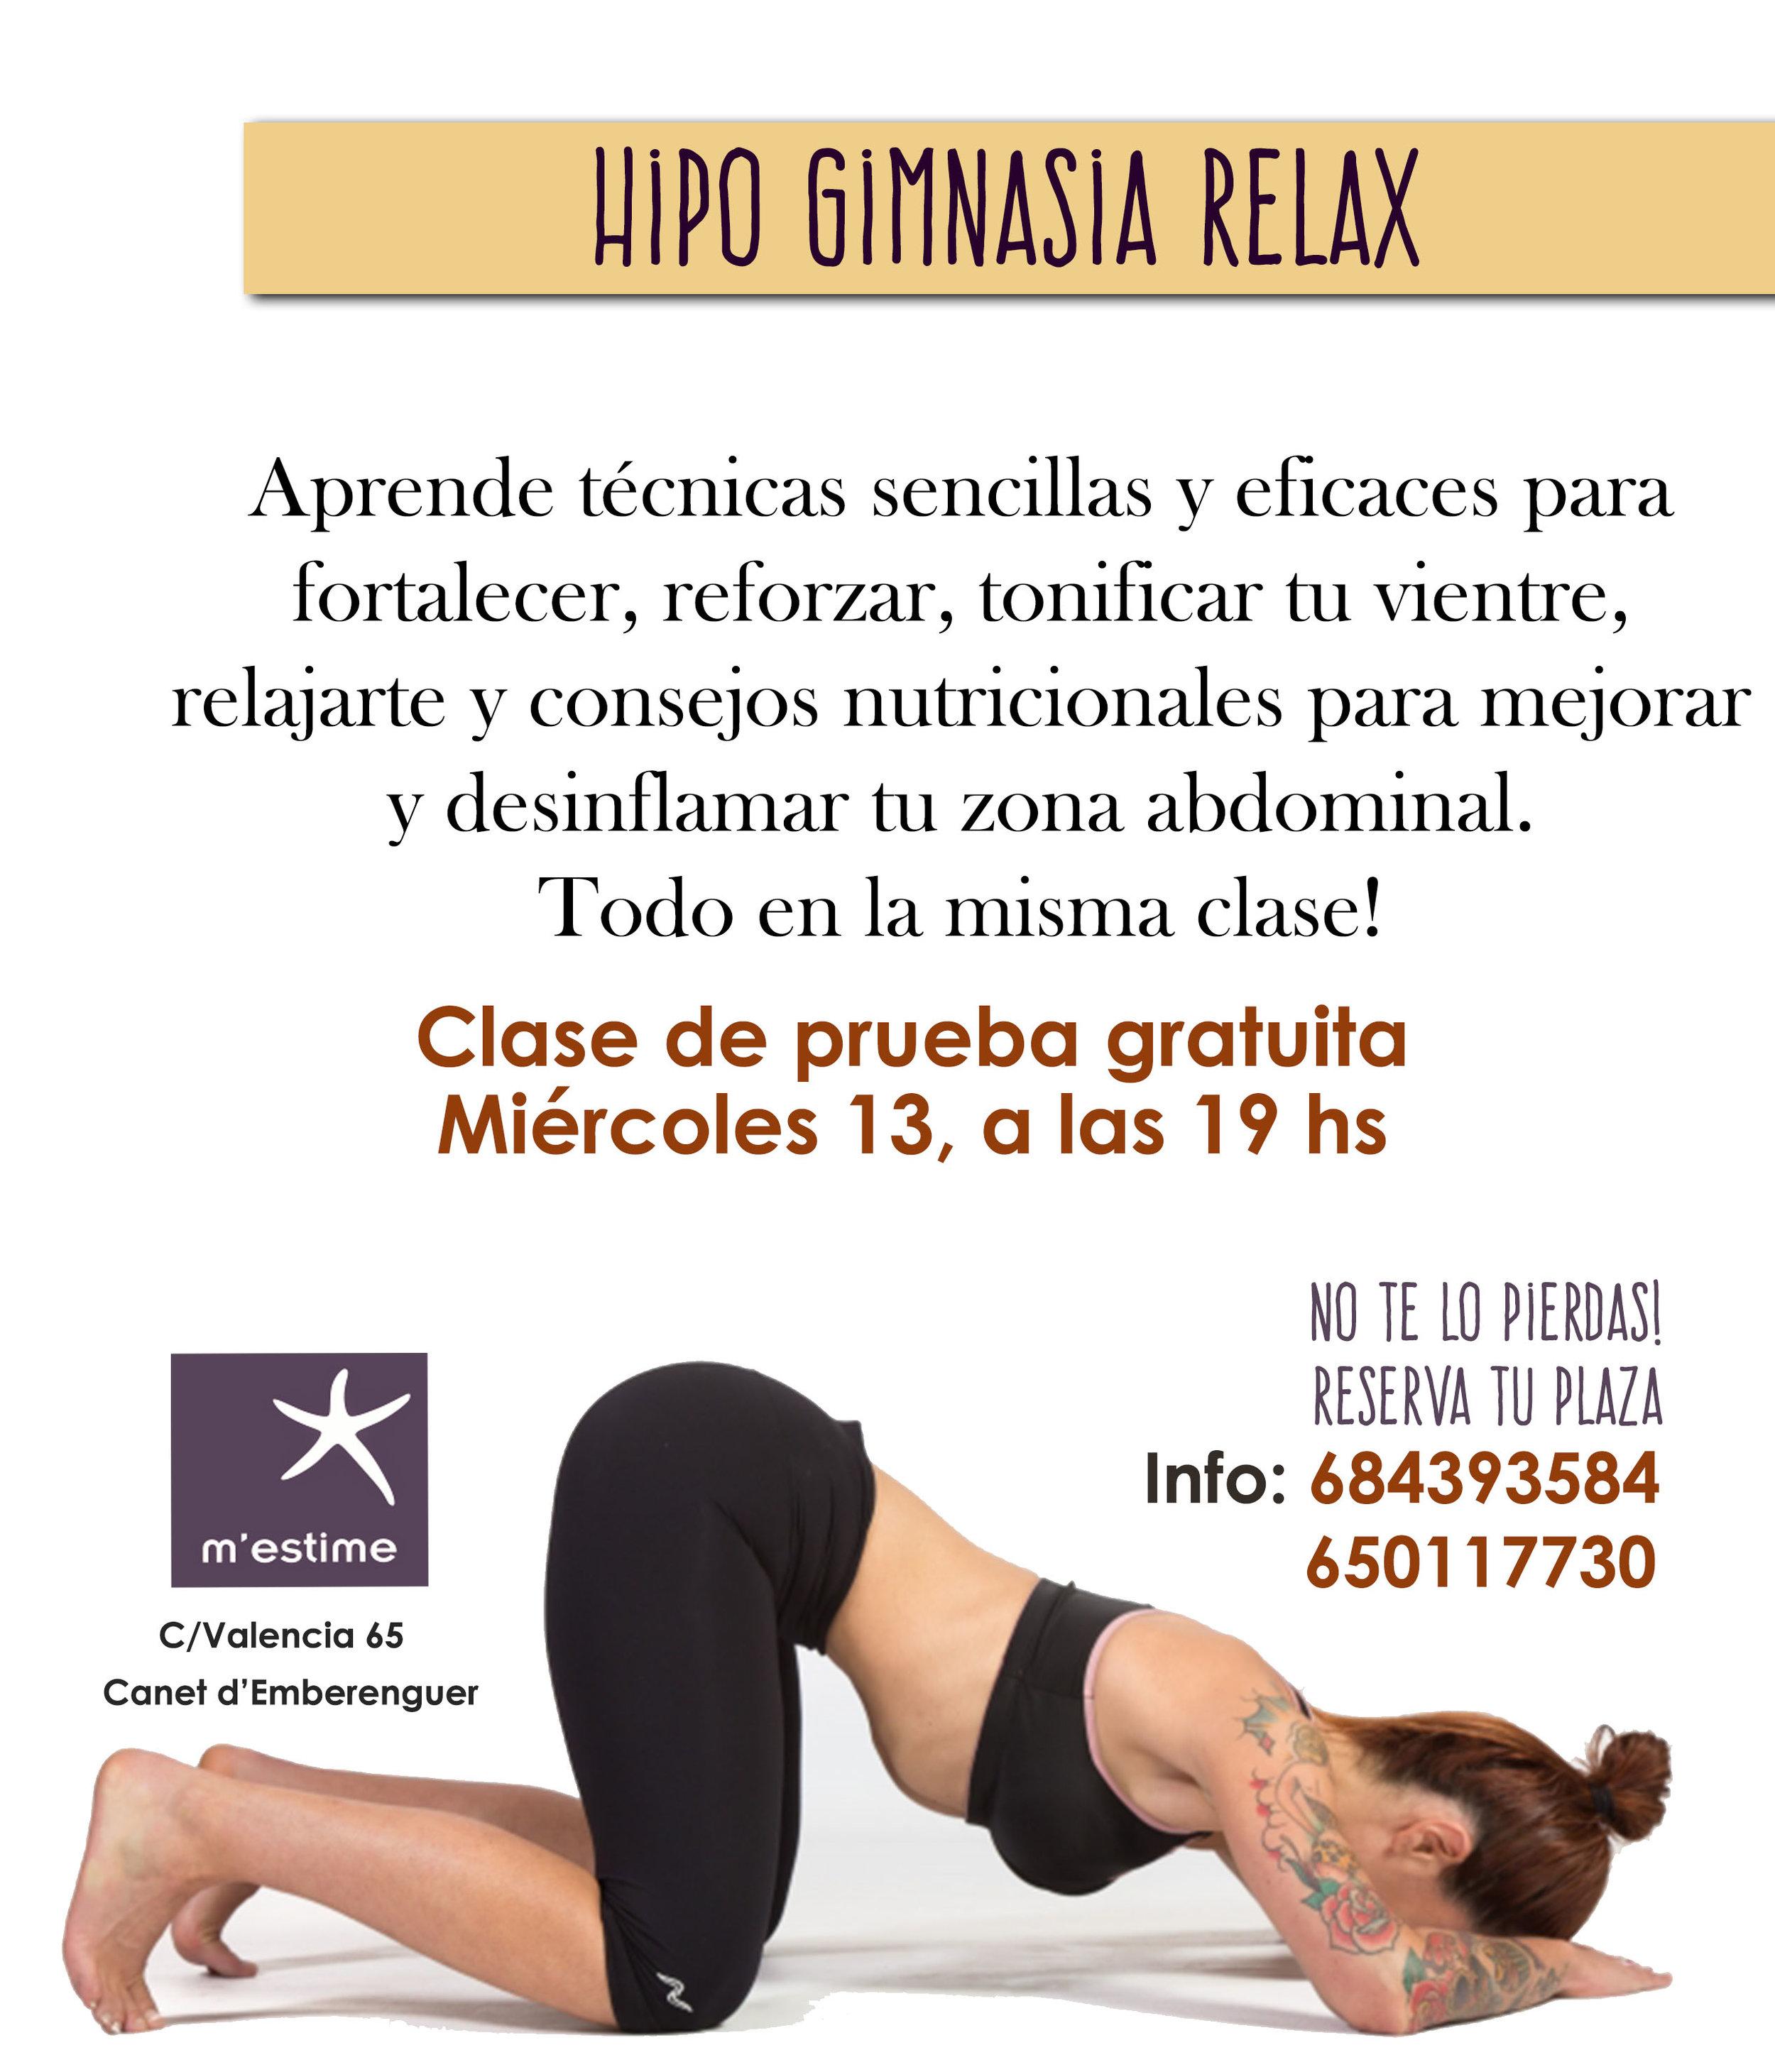 hipo GIMNASIA RELAX.jpg